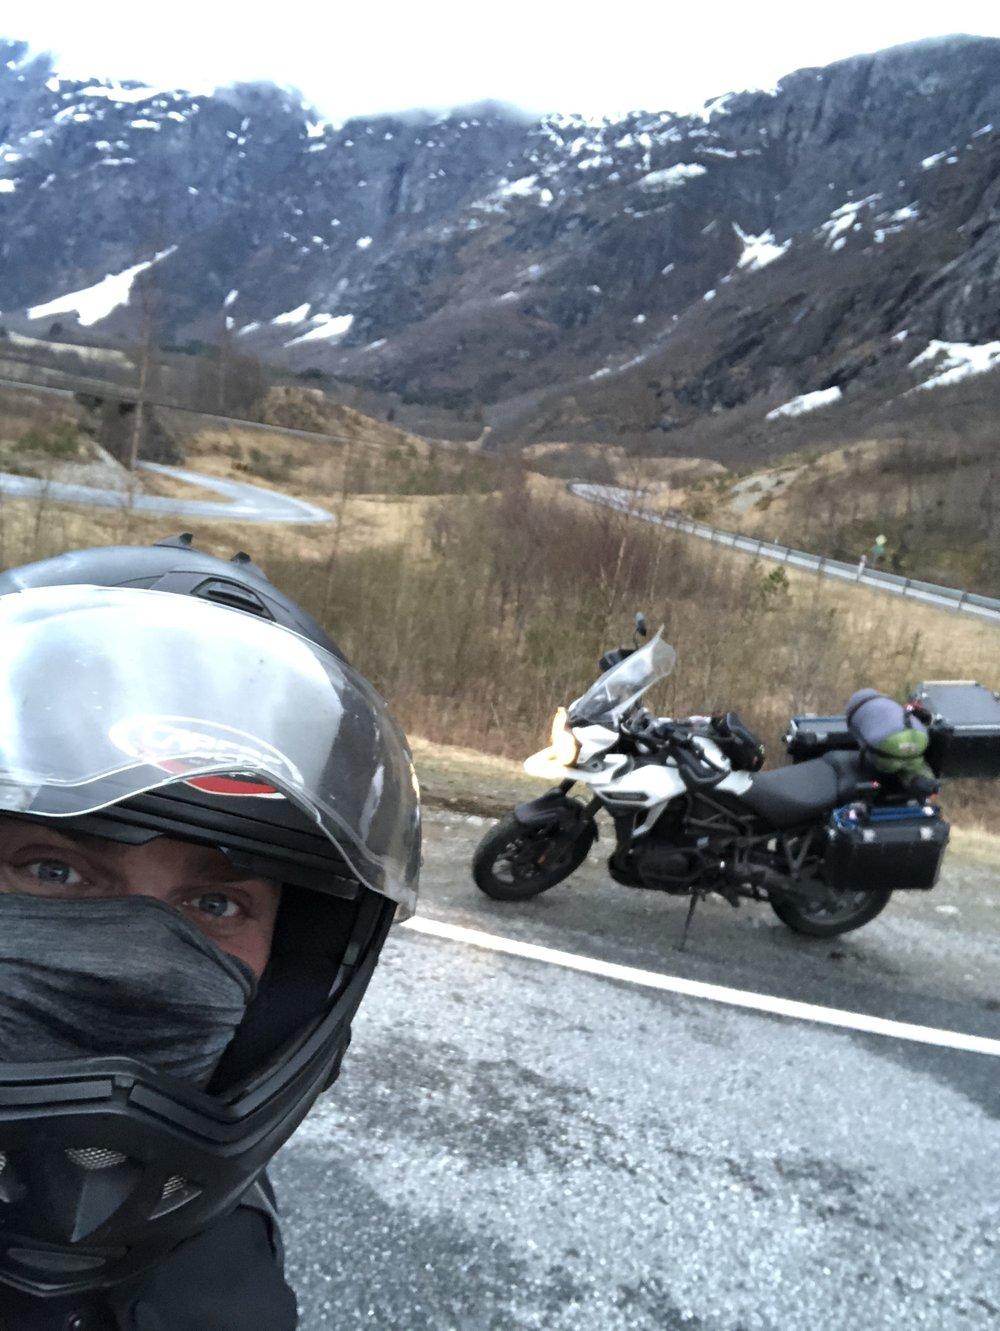 selfie with a bike